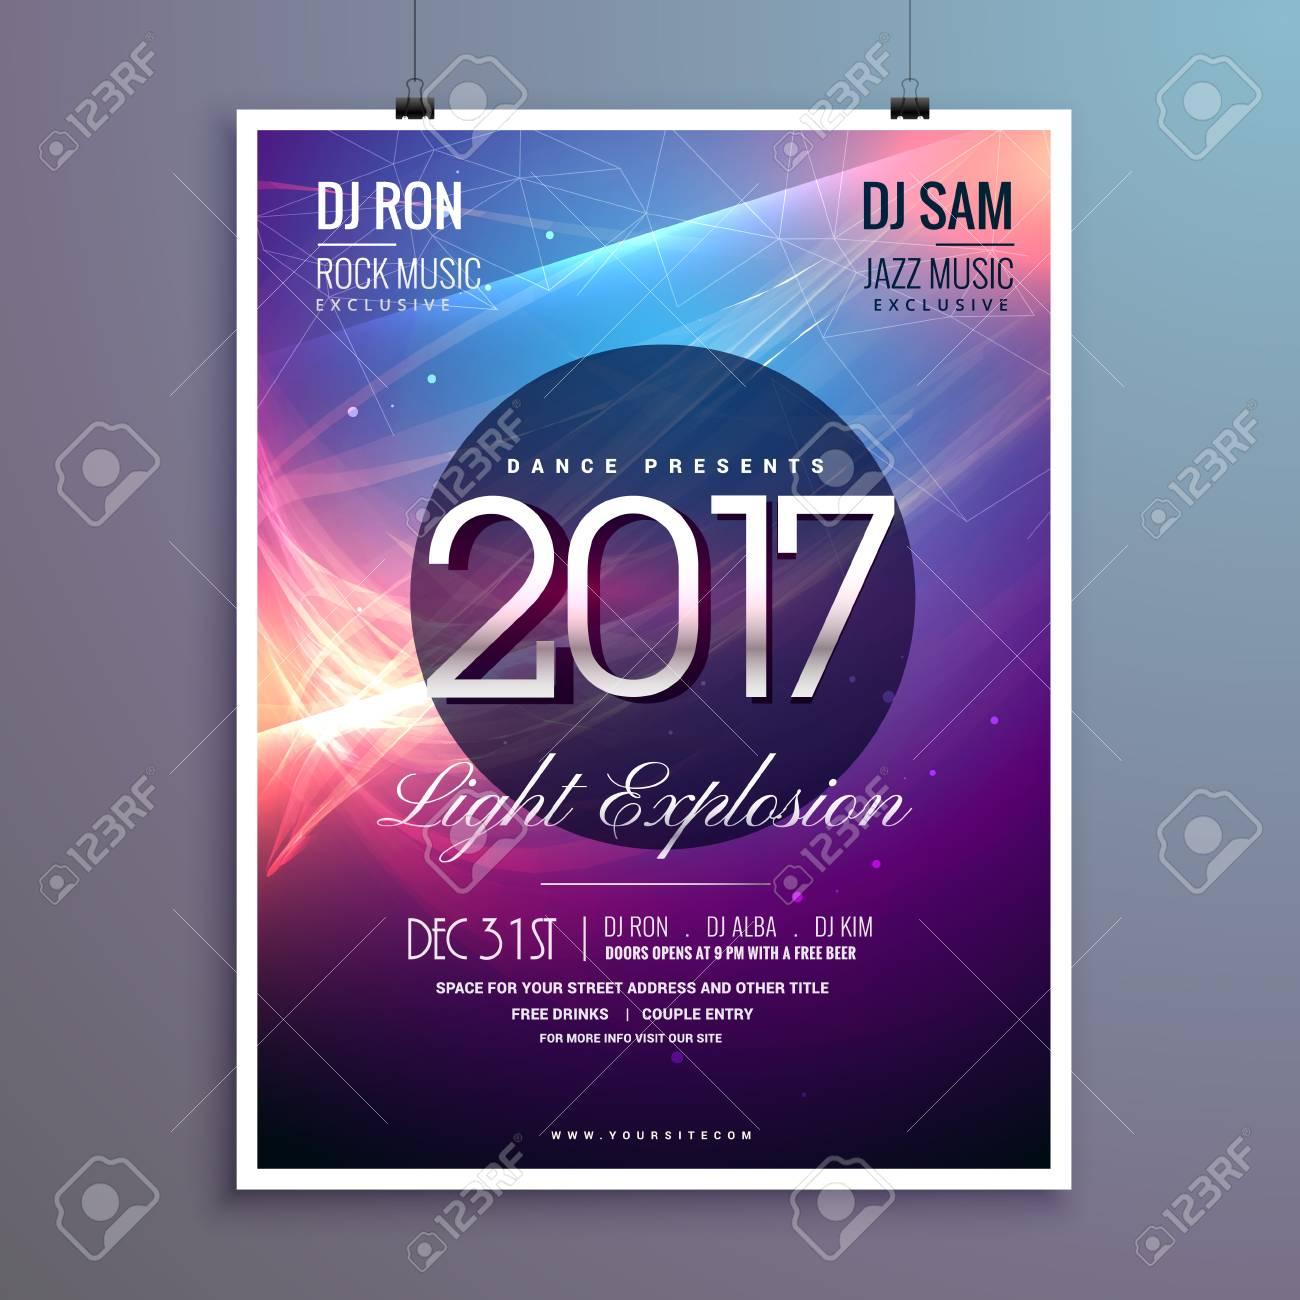 Amazing Happy New Year Party Invitation Template With Abstract - Party invitation template: new year party invitation template